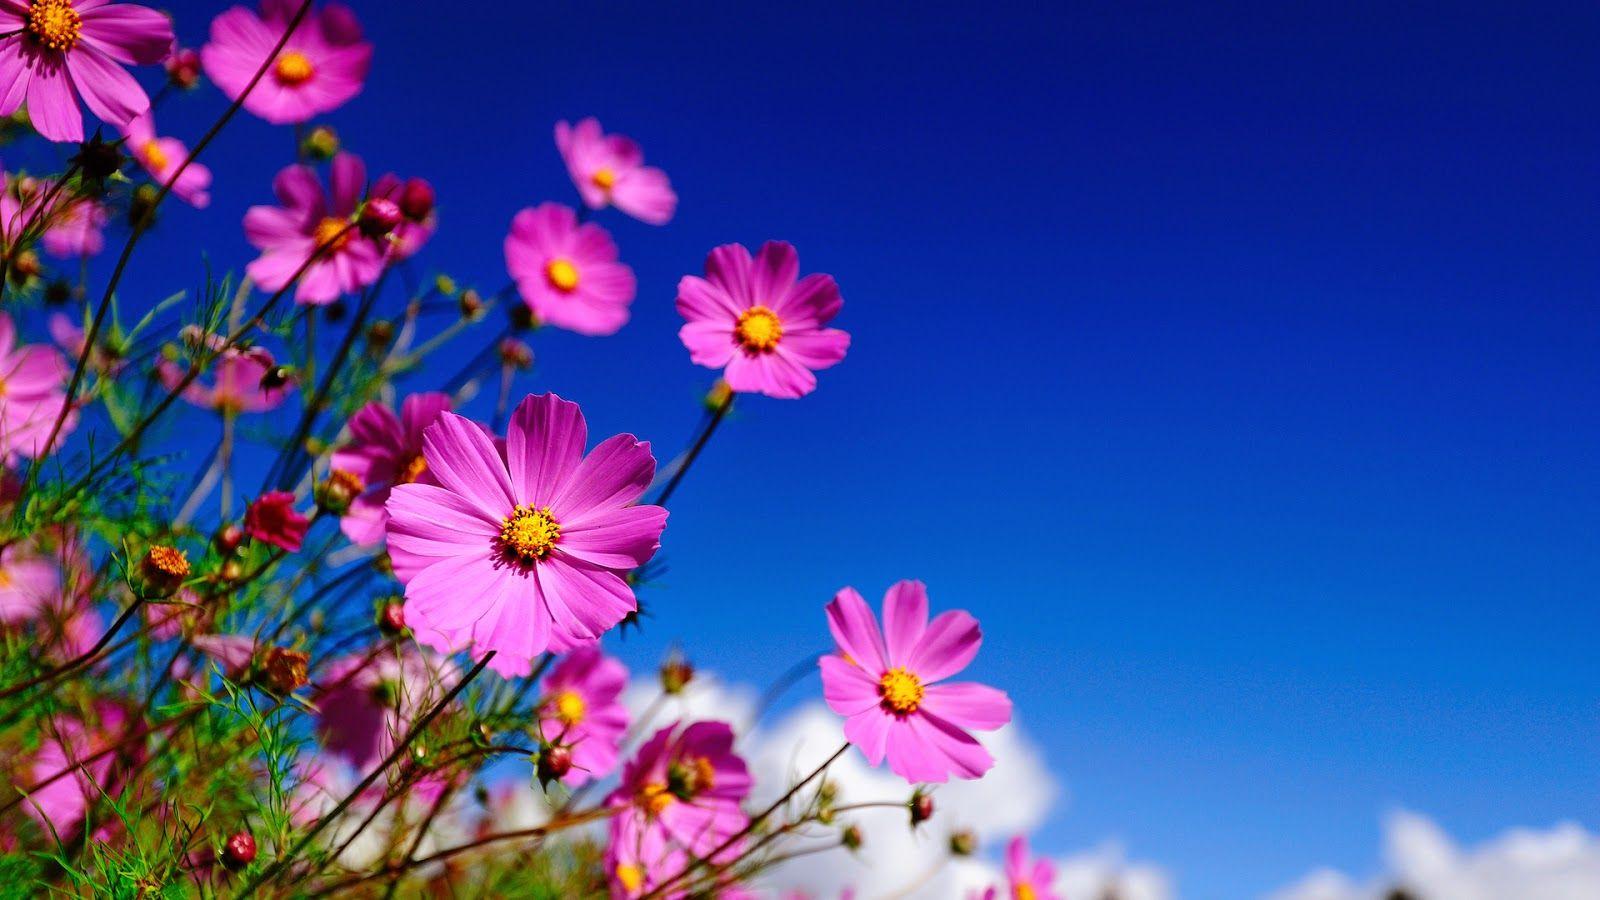 10 Delightful Flowers Wallpaper Desktop Background Full Screen Imagens De Bom Dia Fotos De Bom Dia Bom Dia Wallpaper